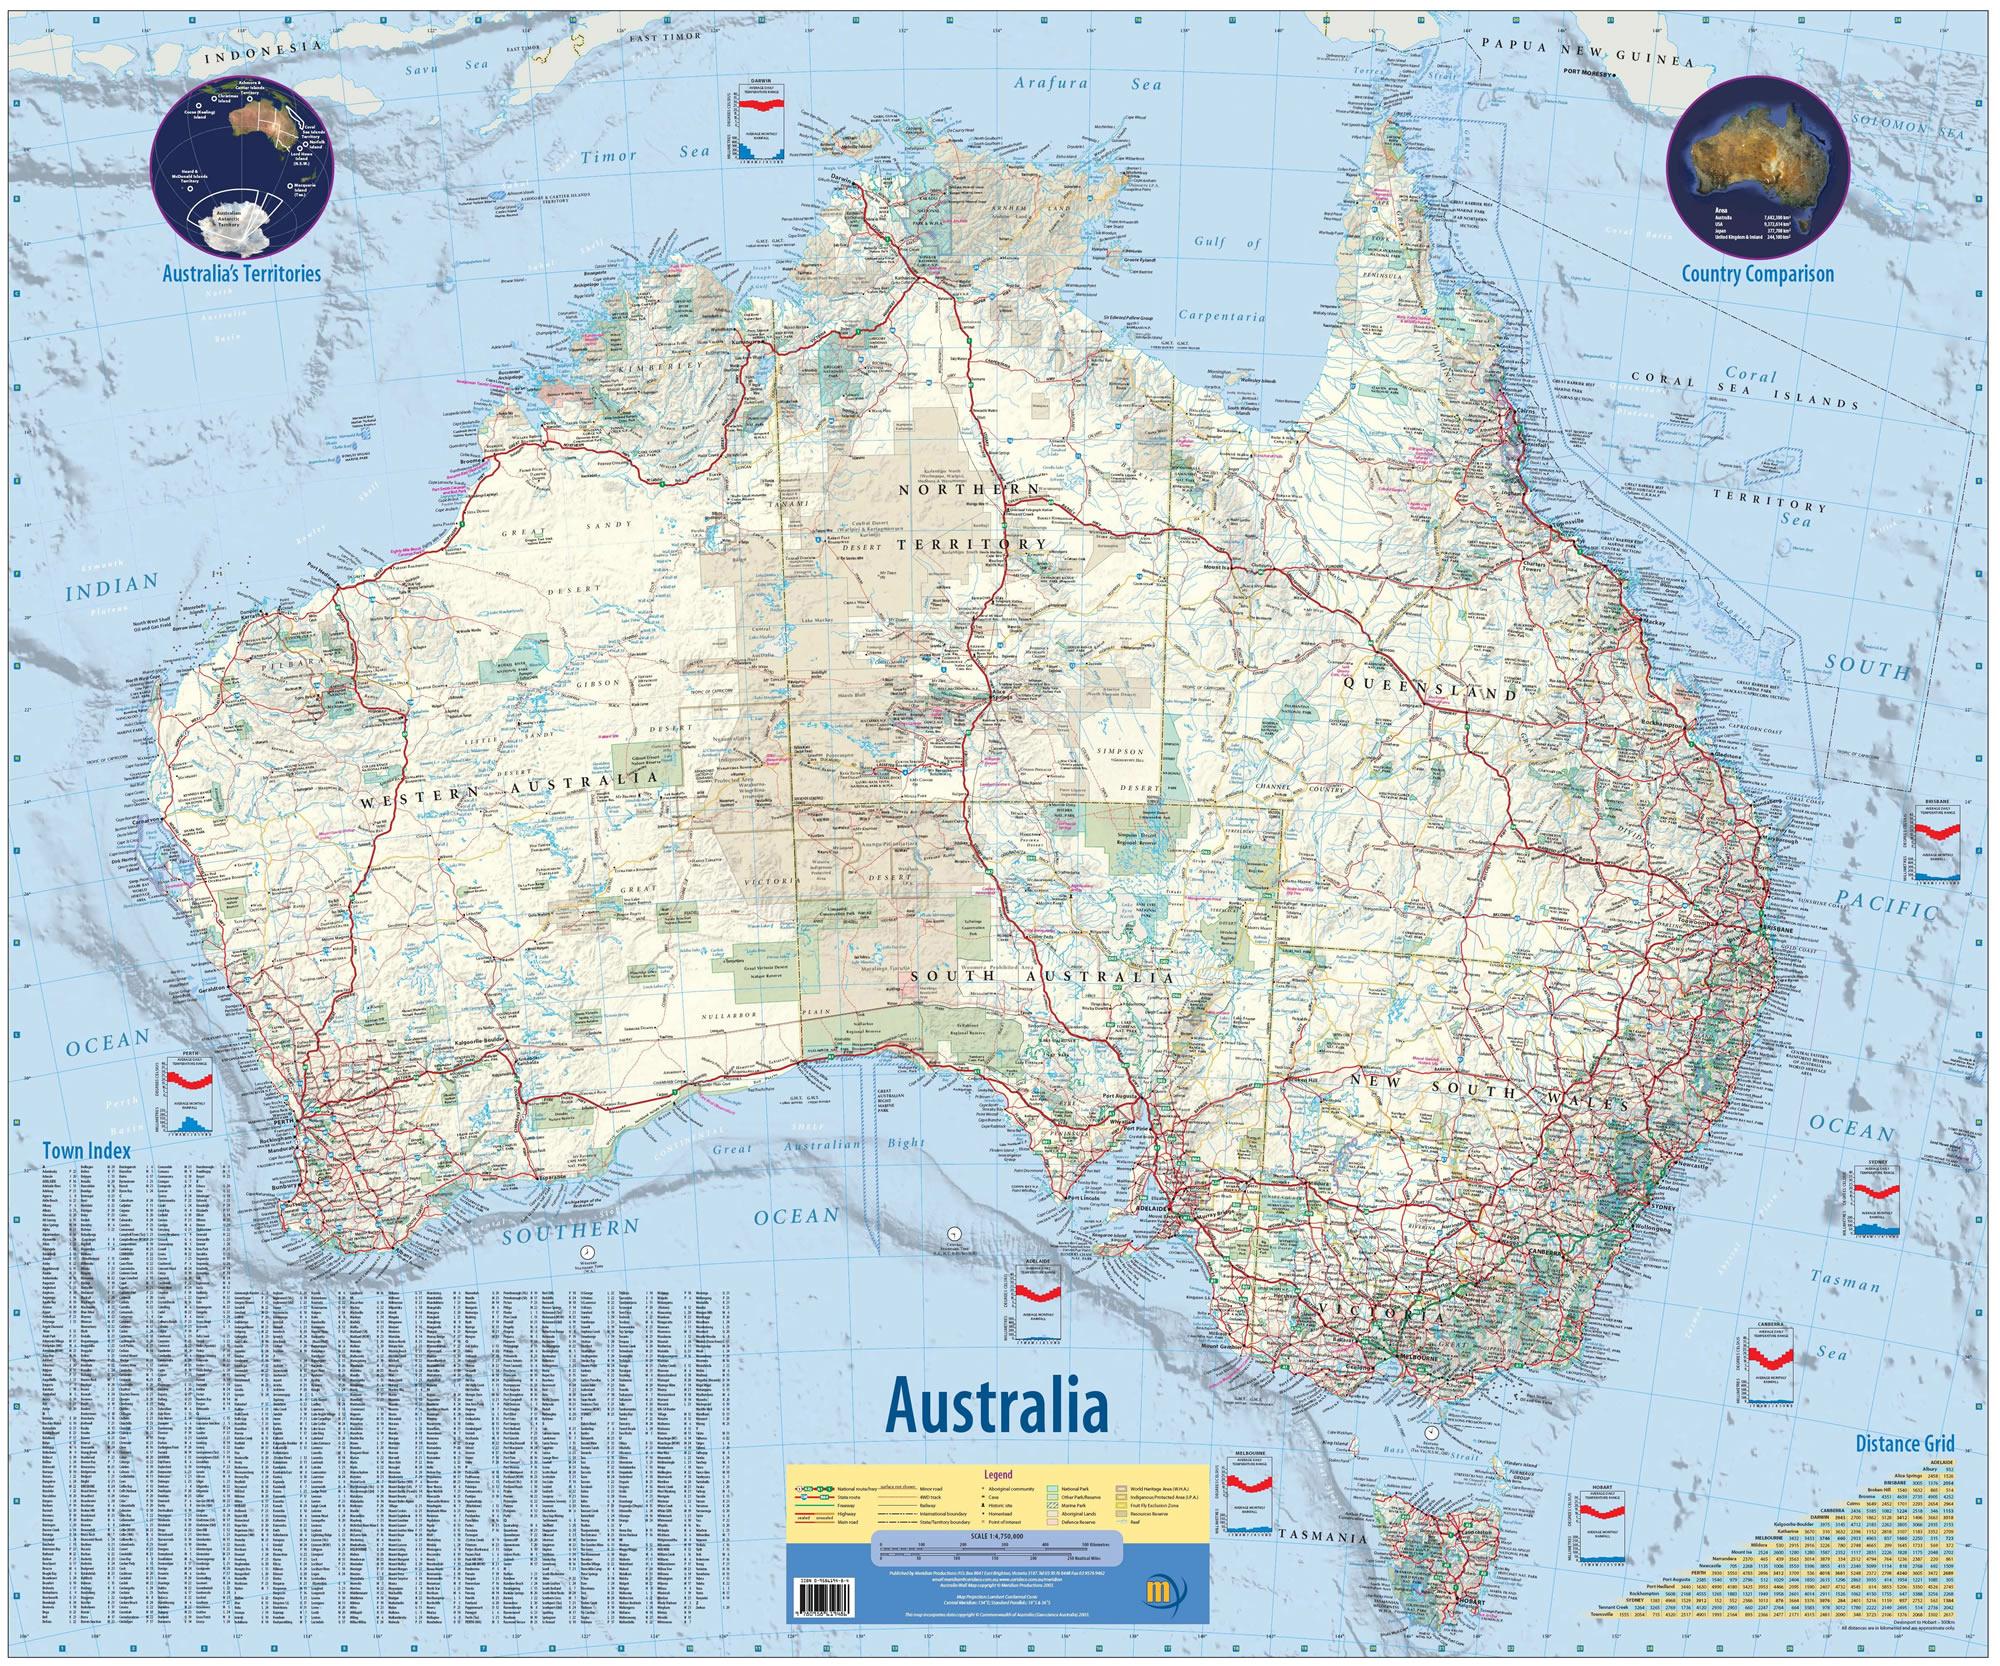 carte australie à imprimer Carte Australie, Carte de Australie